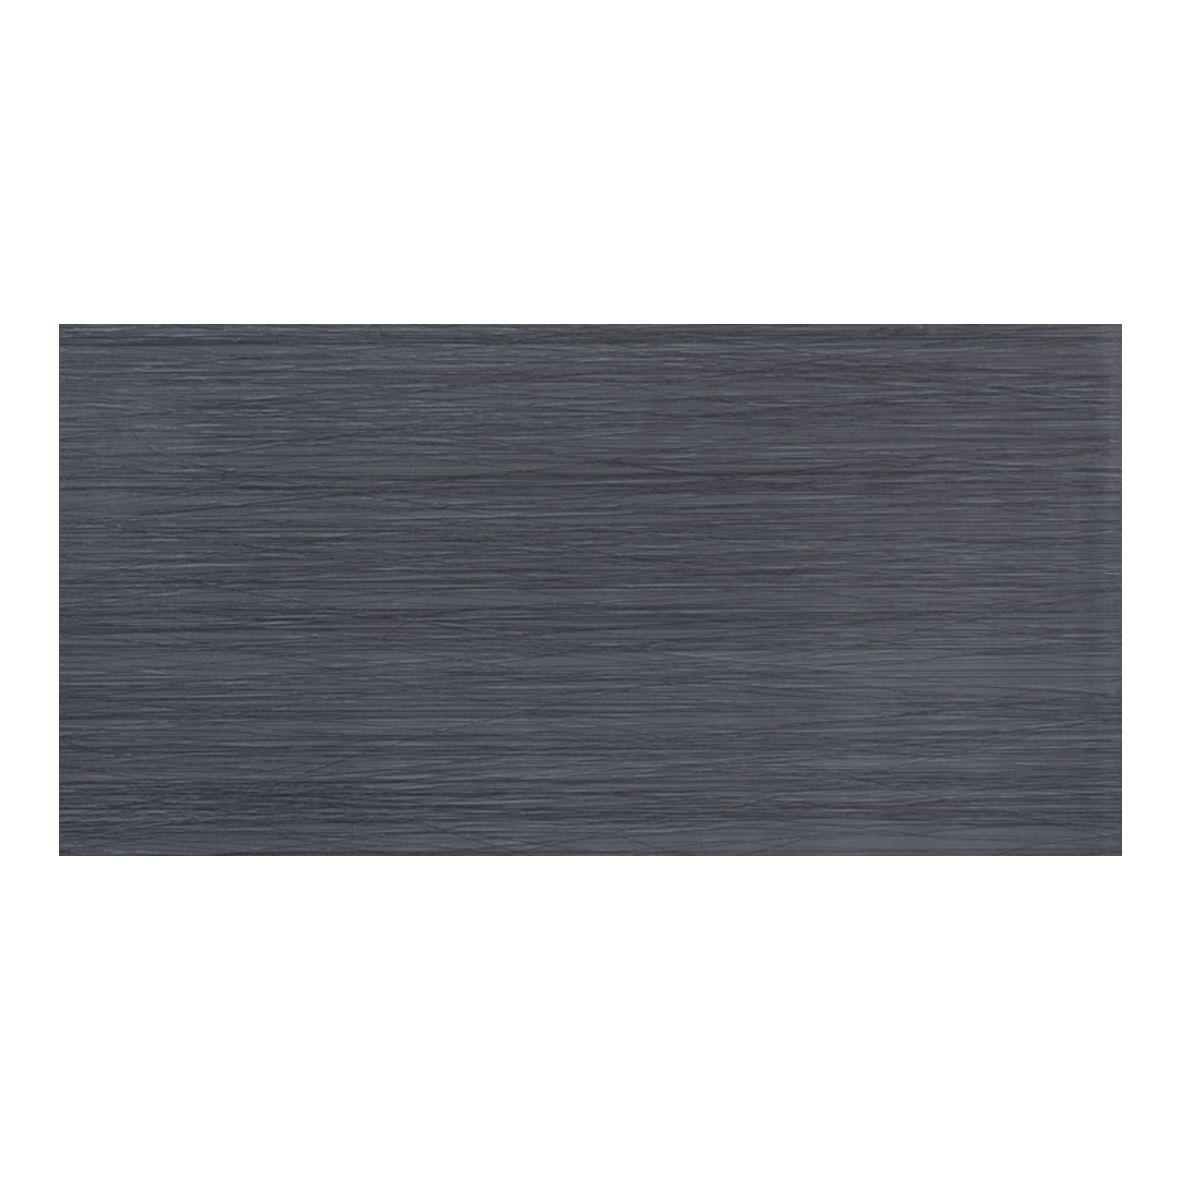 Vitra allure anthracite tile 600x300mm bathroom wall tiles vitra allure anthracite tile 600x300mm bathroom wall tiles gemini tiles doublecrazyfo Choice Image